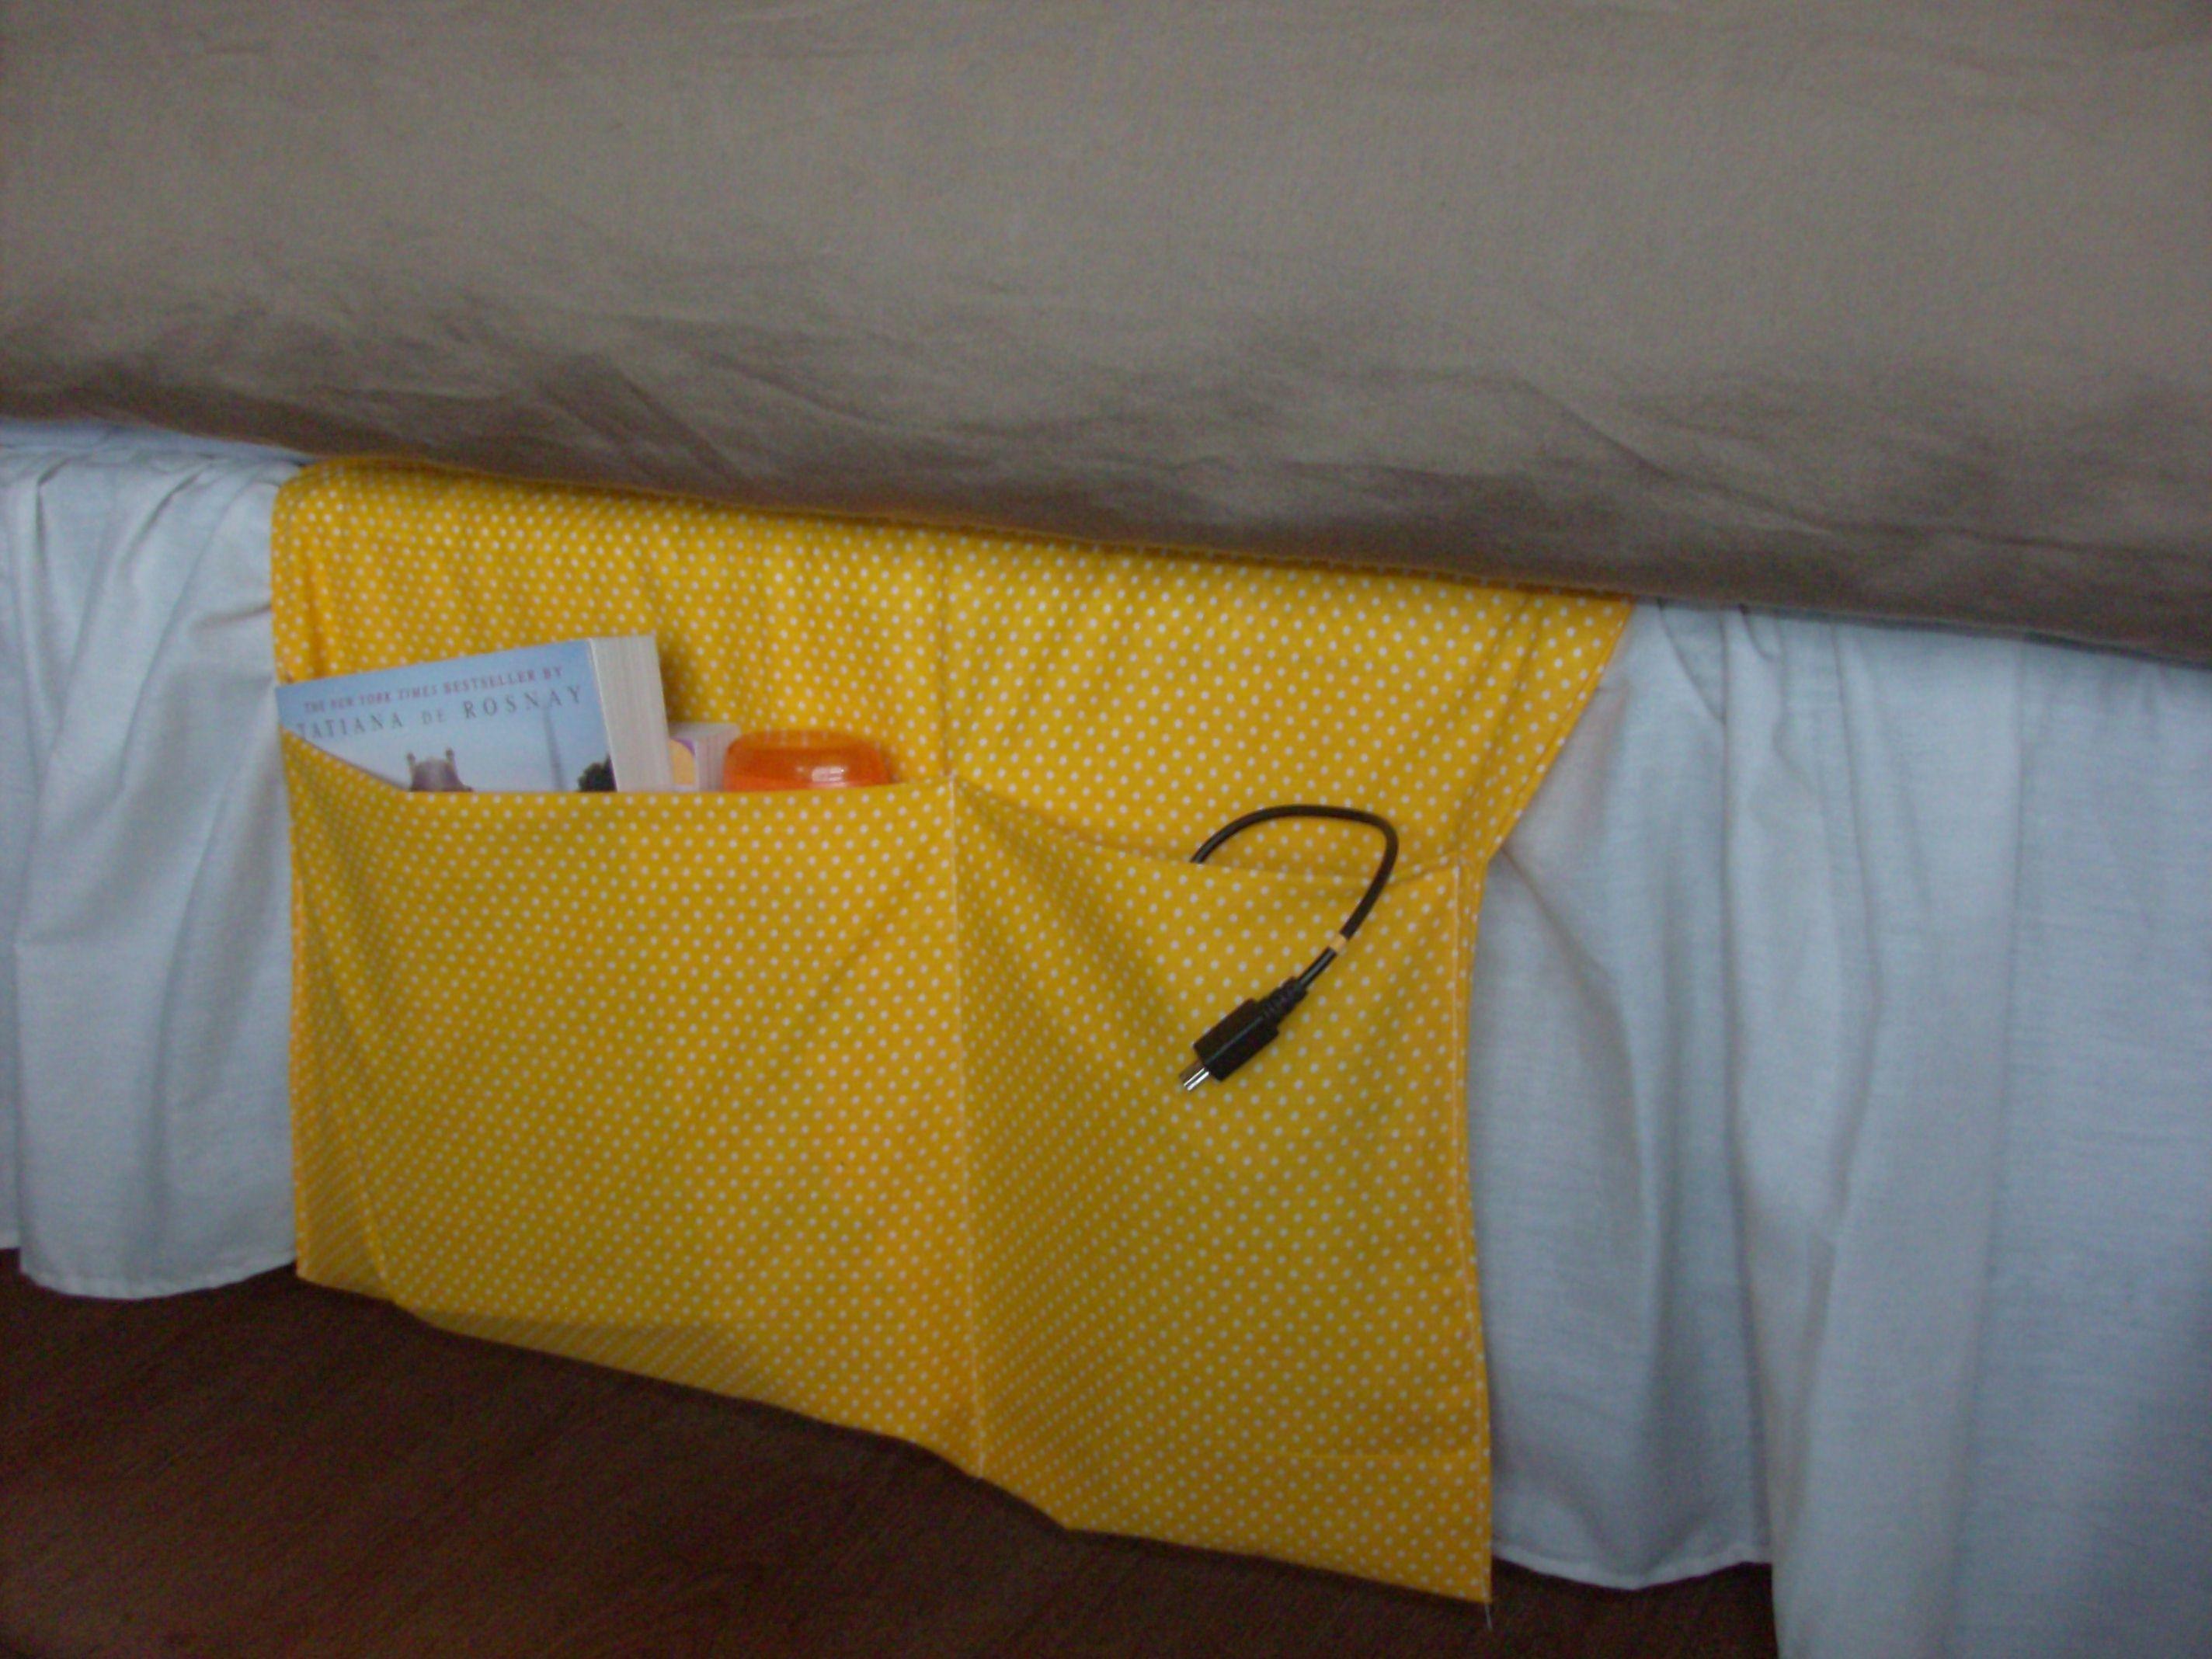 Homemade Gift bedside organizer 5